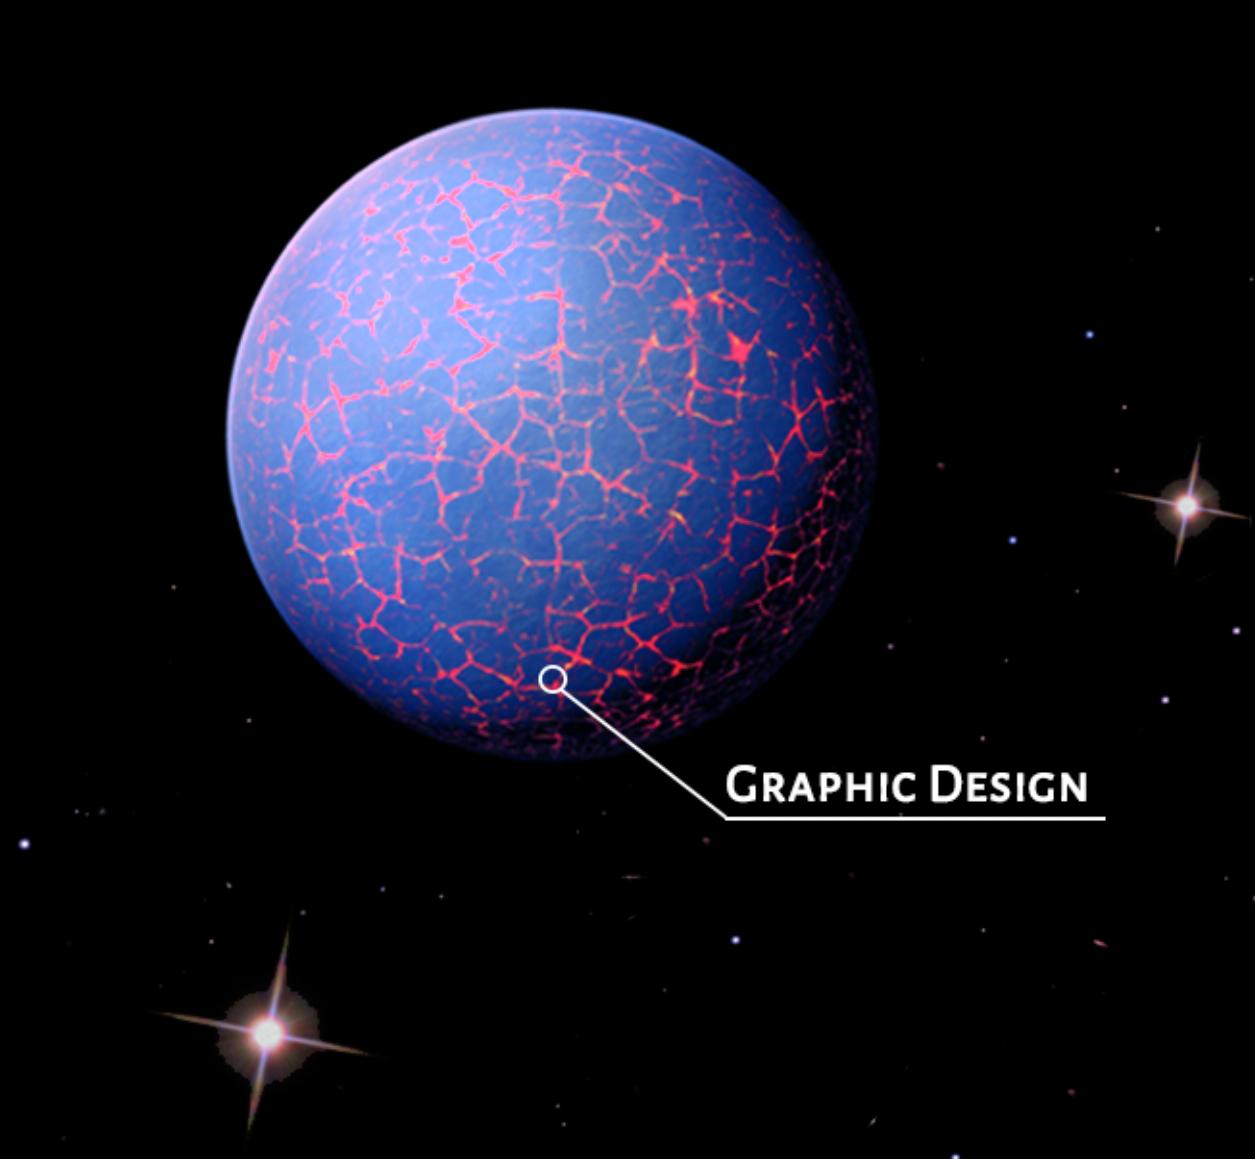 graphic design (neptune)